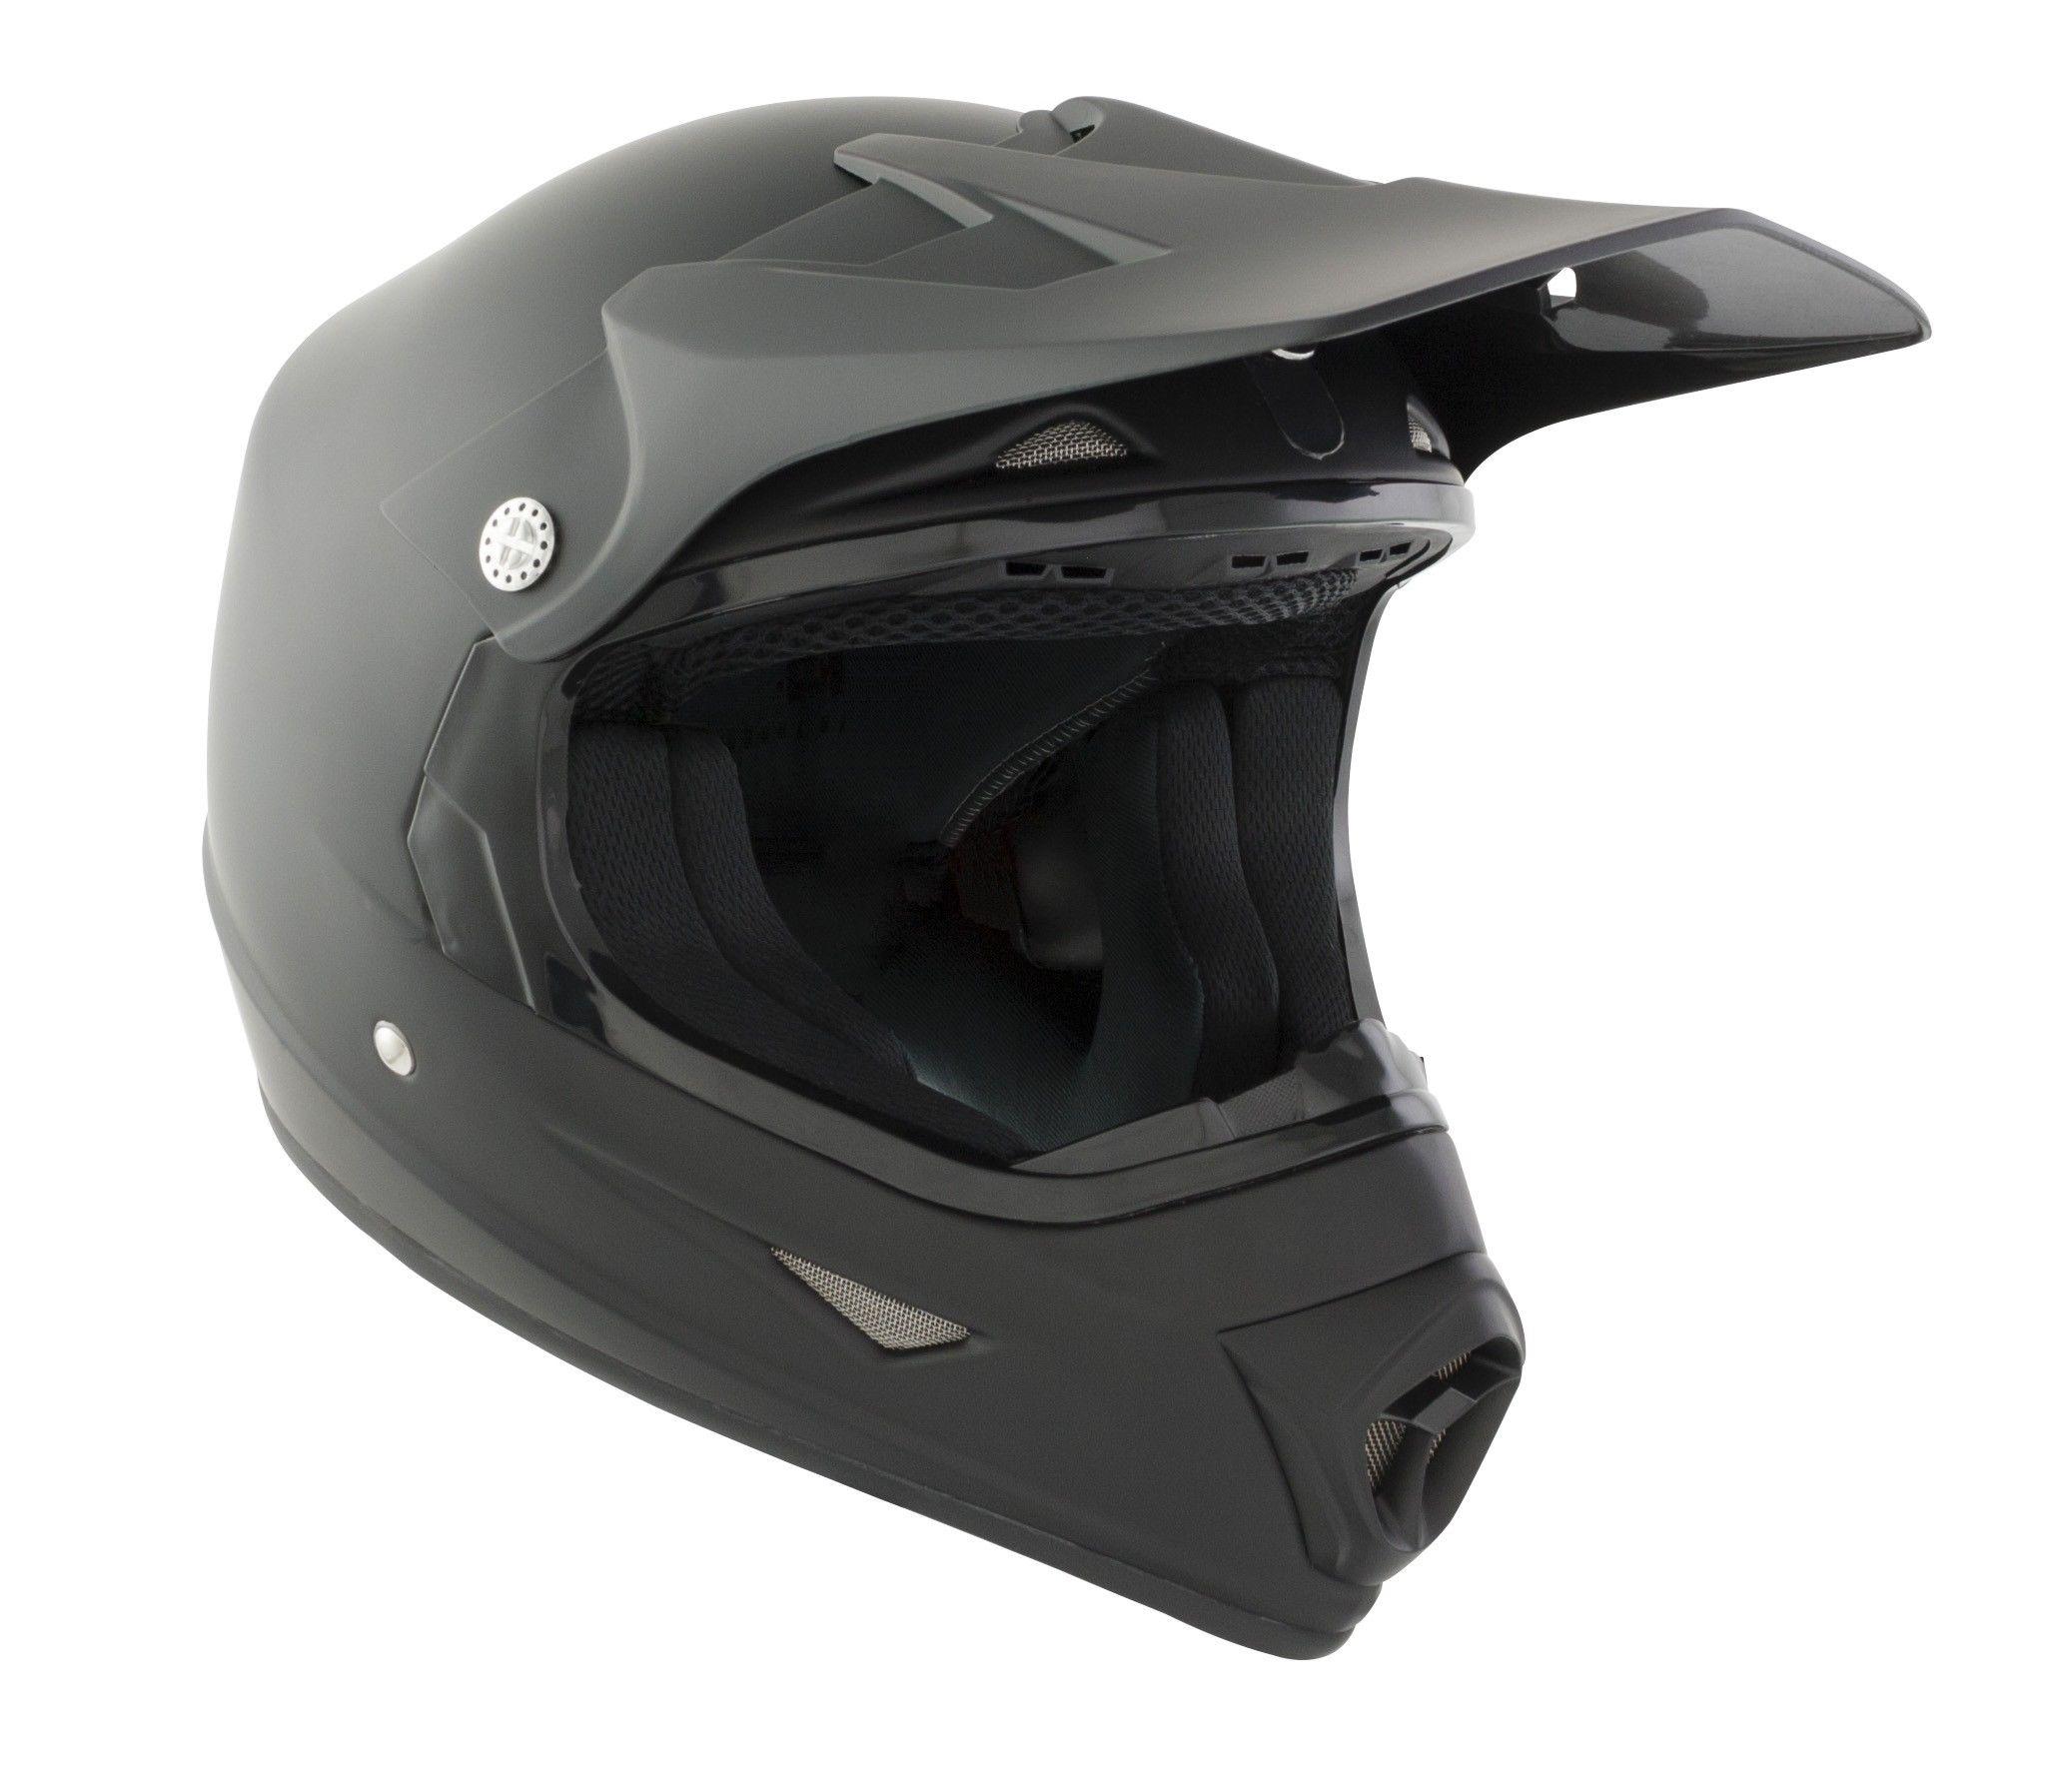 【GSB】XP-7 MX 青少年越野安全帽 - 「Webike-摩托百貨」